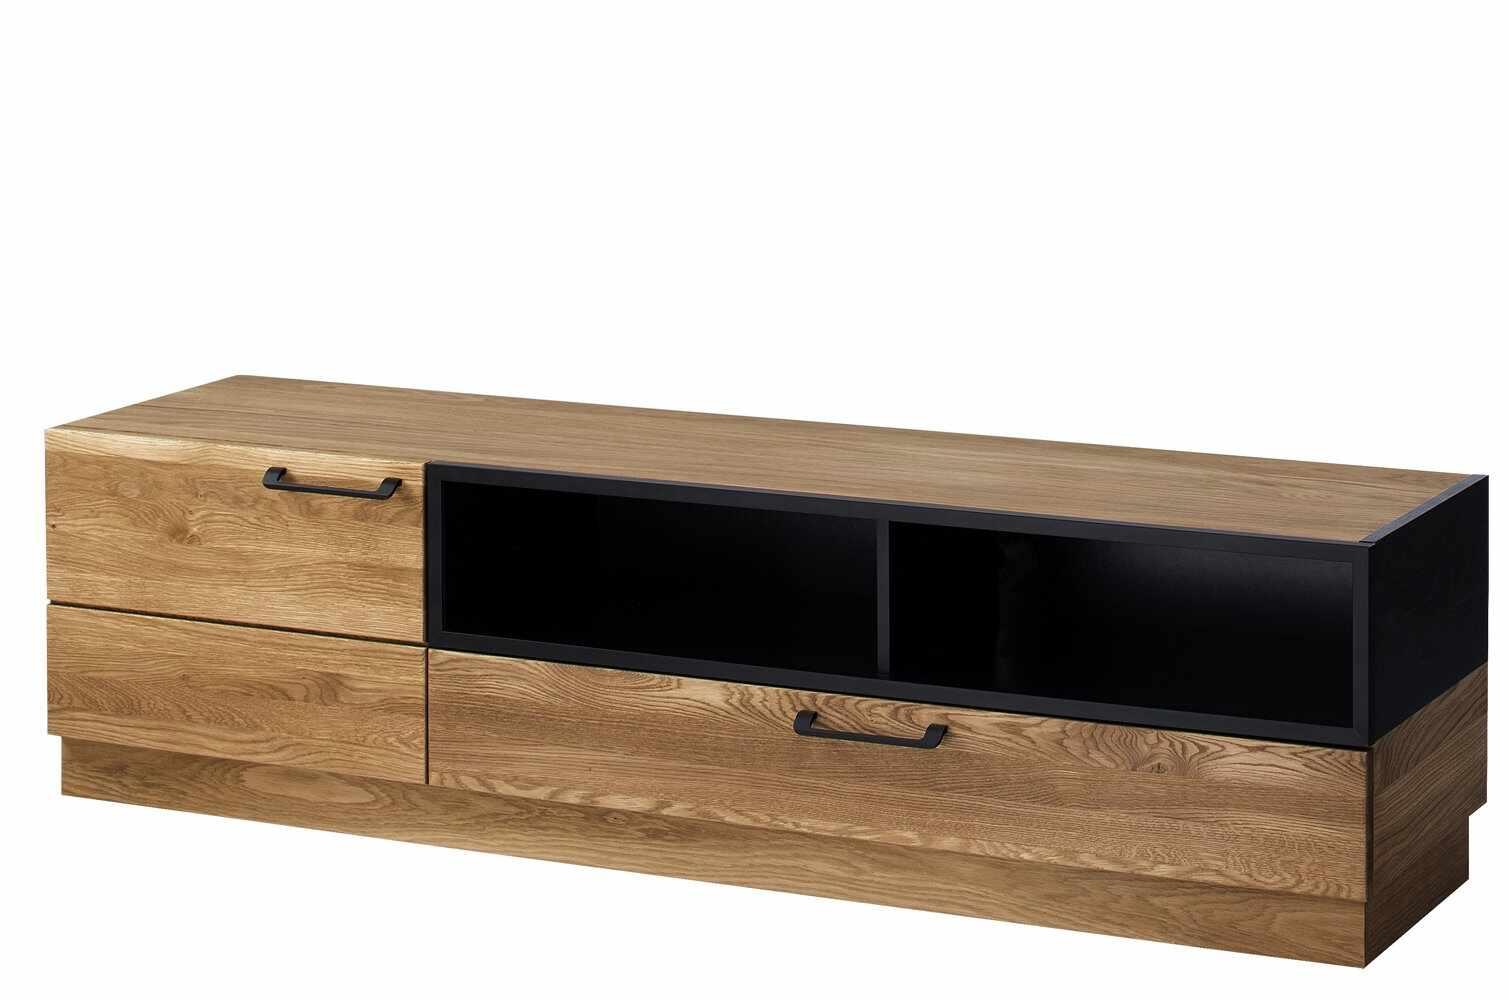 Comoda TV din lemn si furnir, cu 1 sertar si 1 usa Large Mosaic 25 Stejar / Negru, l170xA42xH46 cm la pret 2569 lei